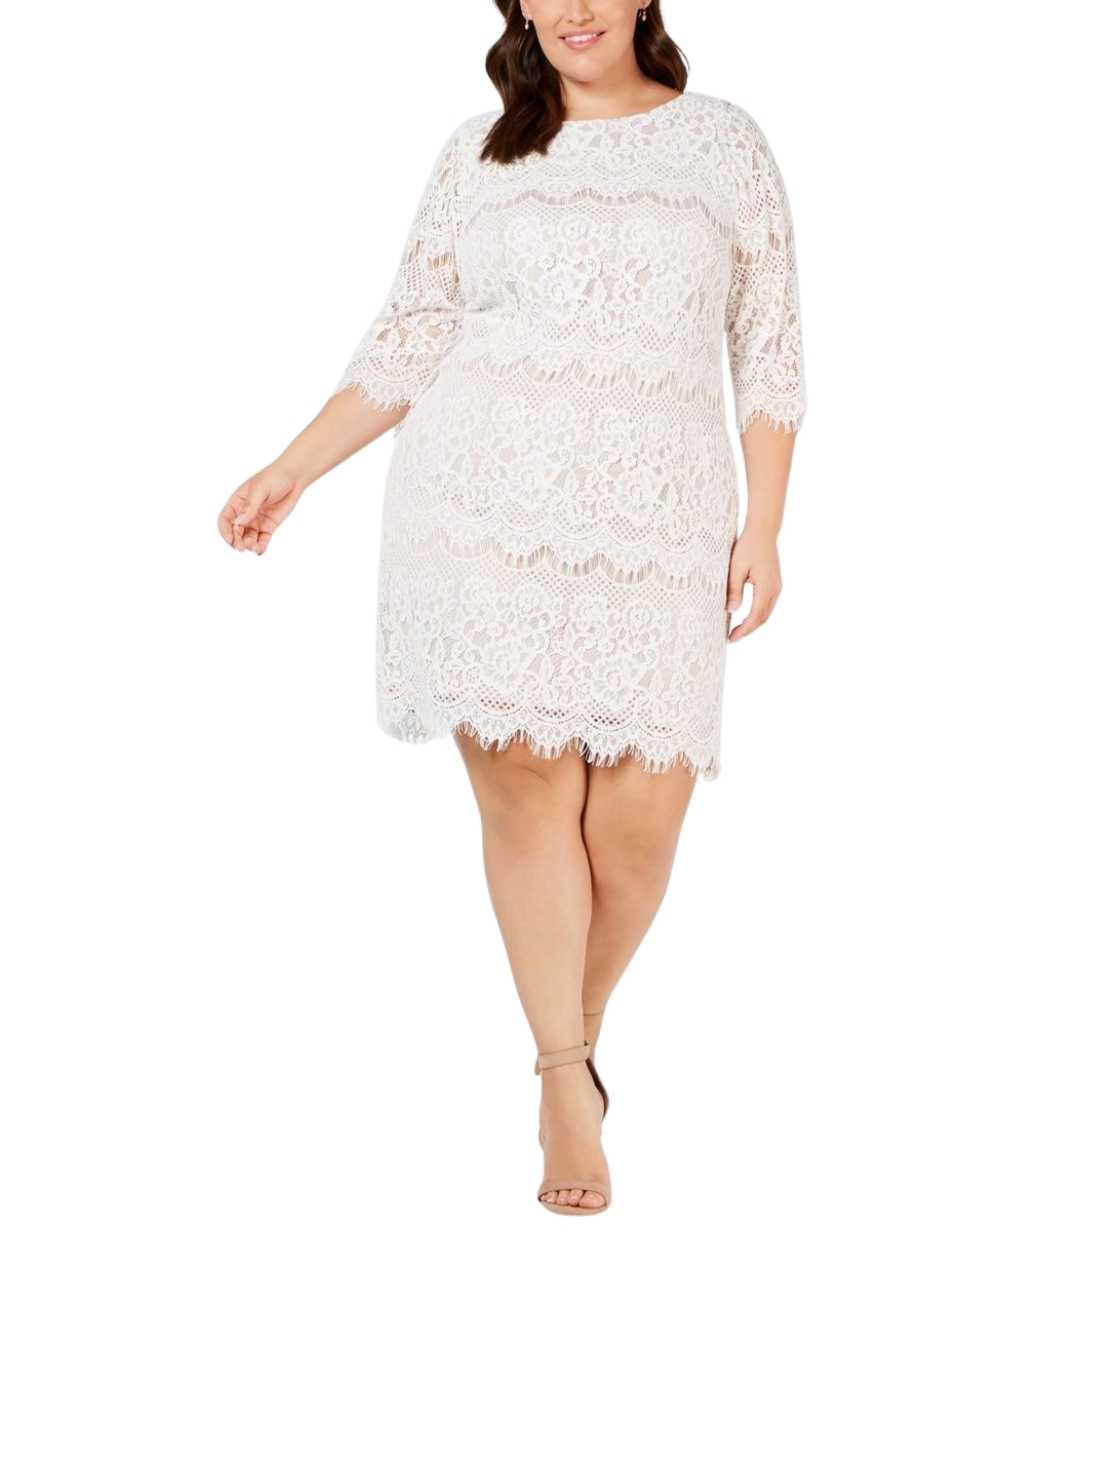 Women Plus Size Dresses White Dress (1)